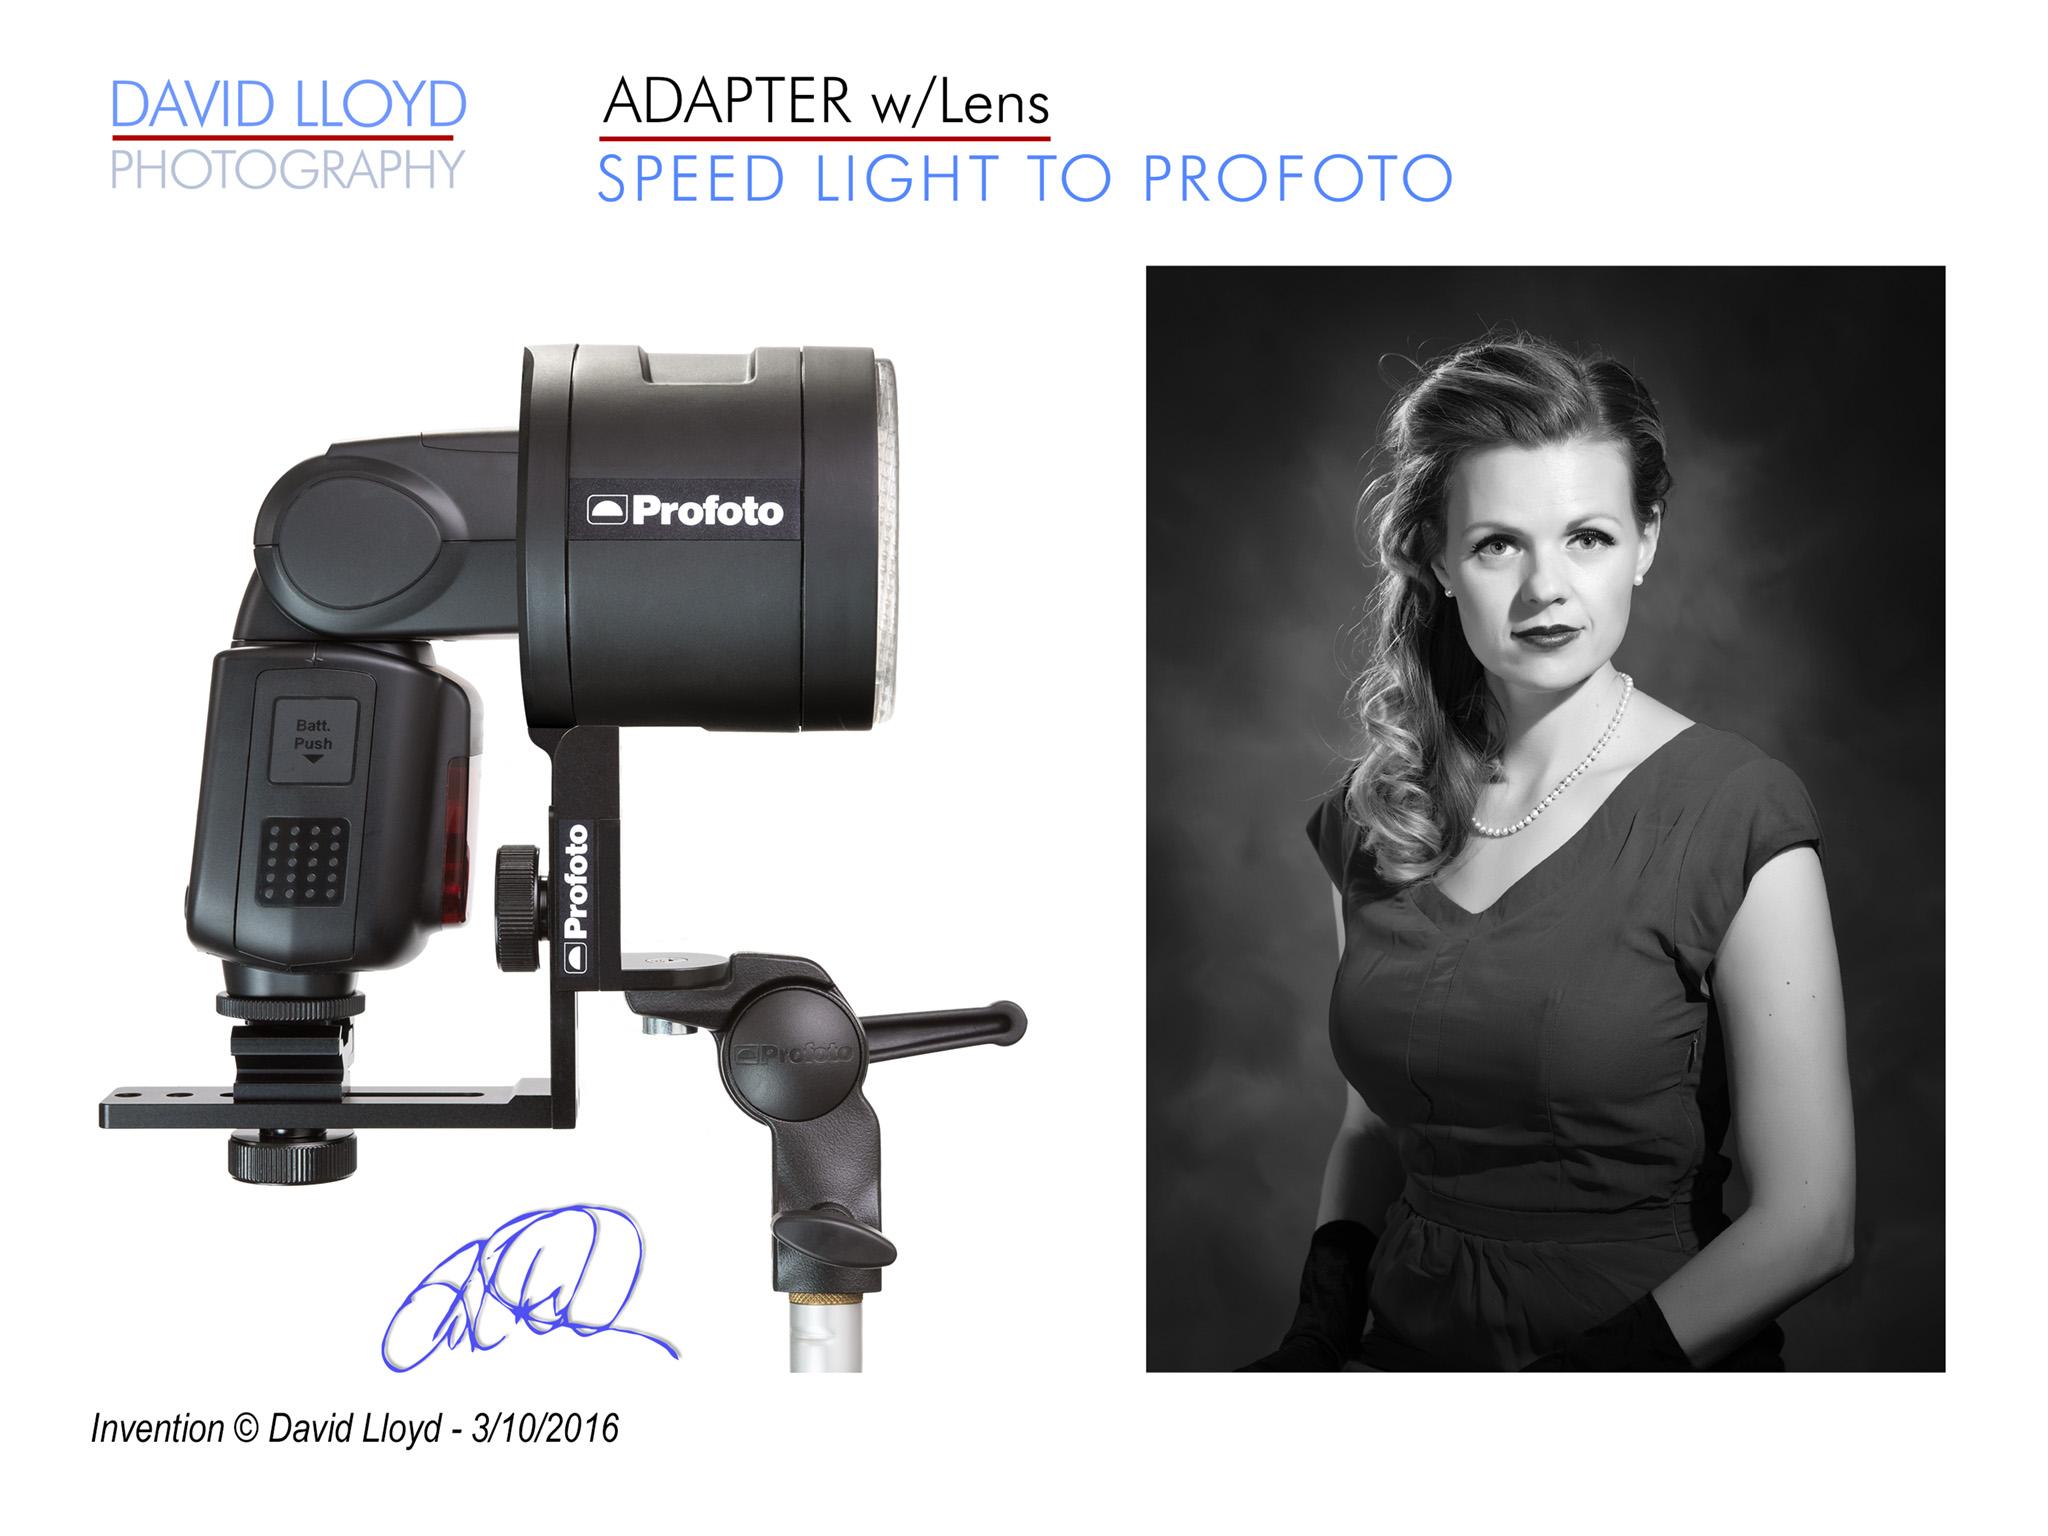 2048px-dlp-profoto-adapter.jpg